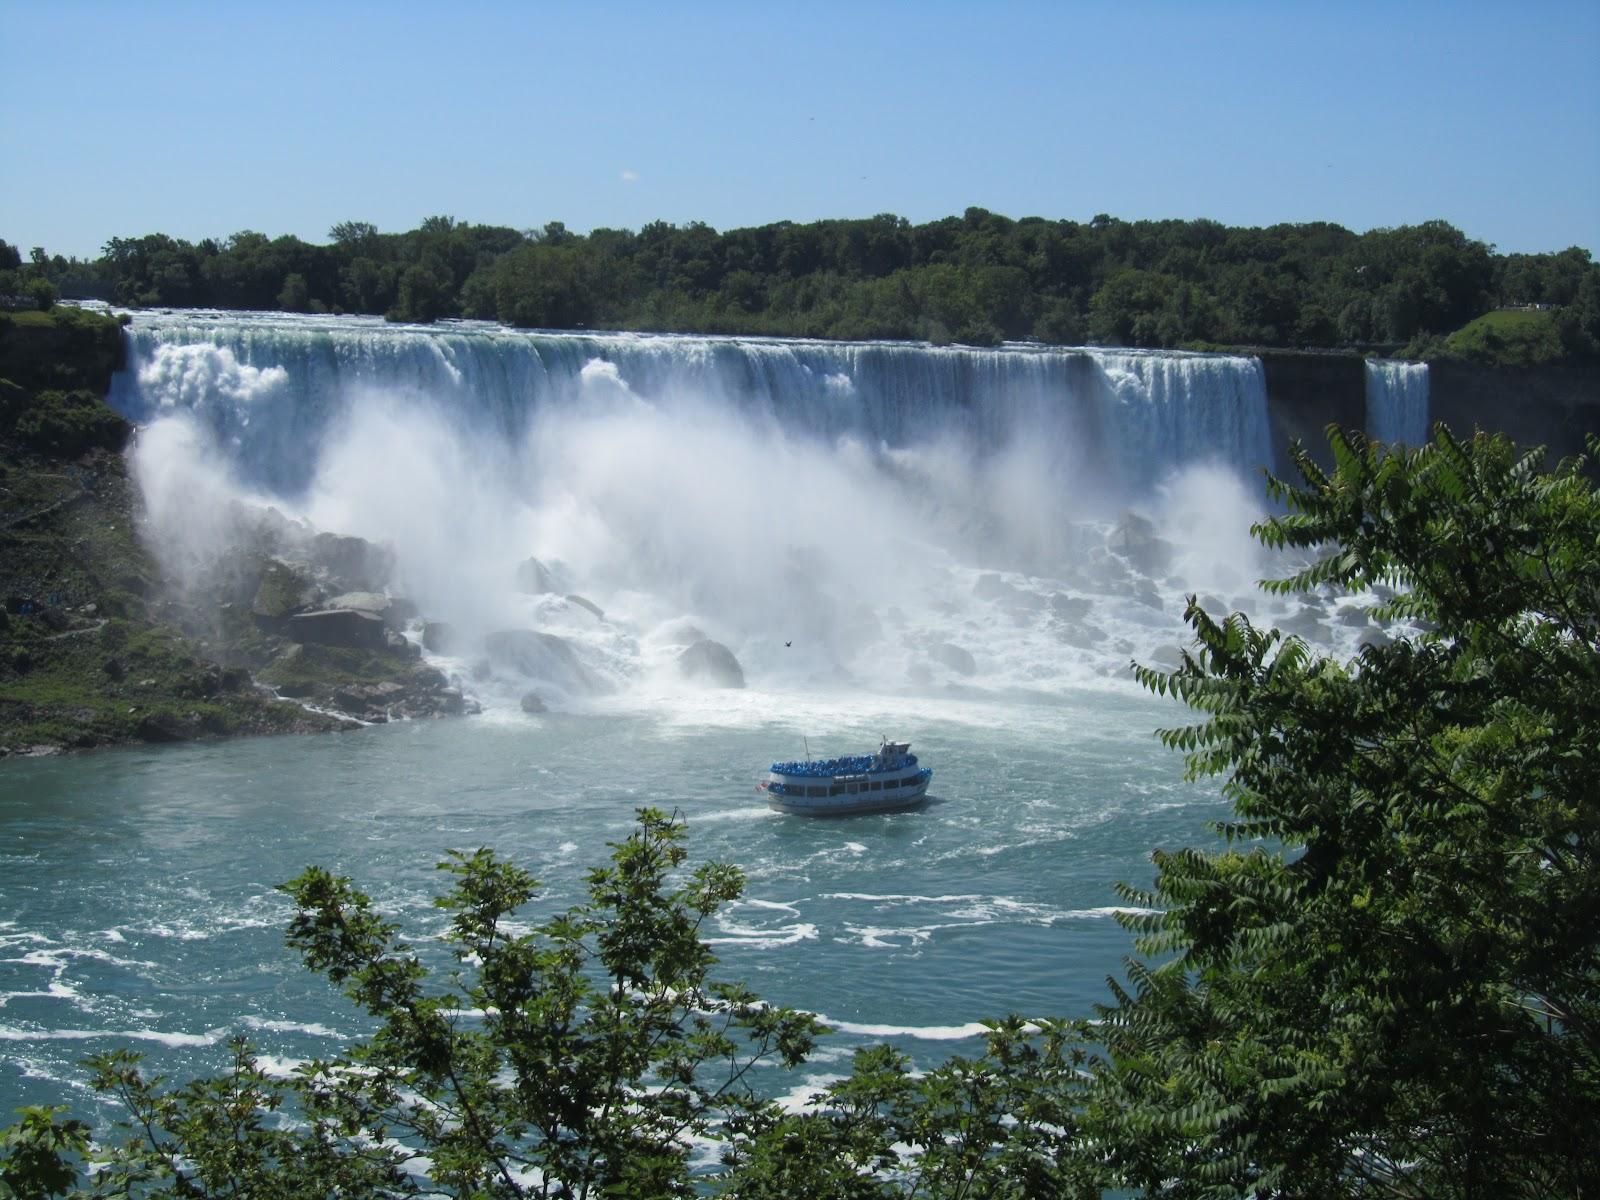 horseshoe falls, niagara falls, niagara falls picture